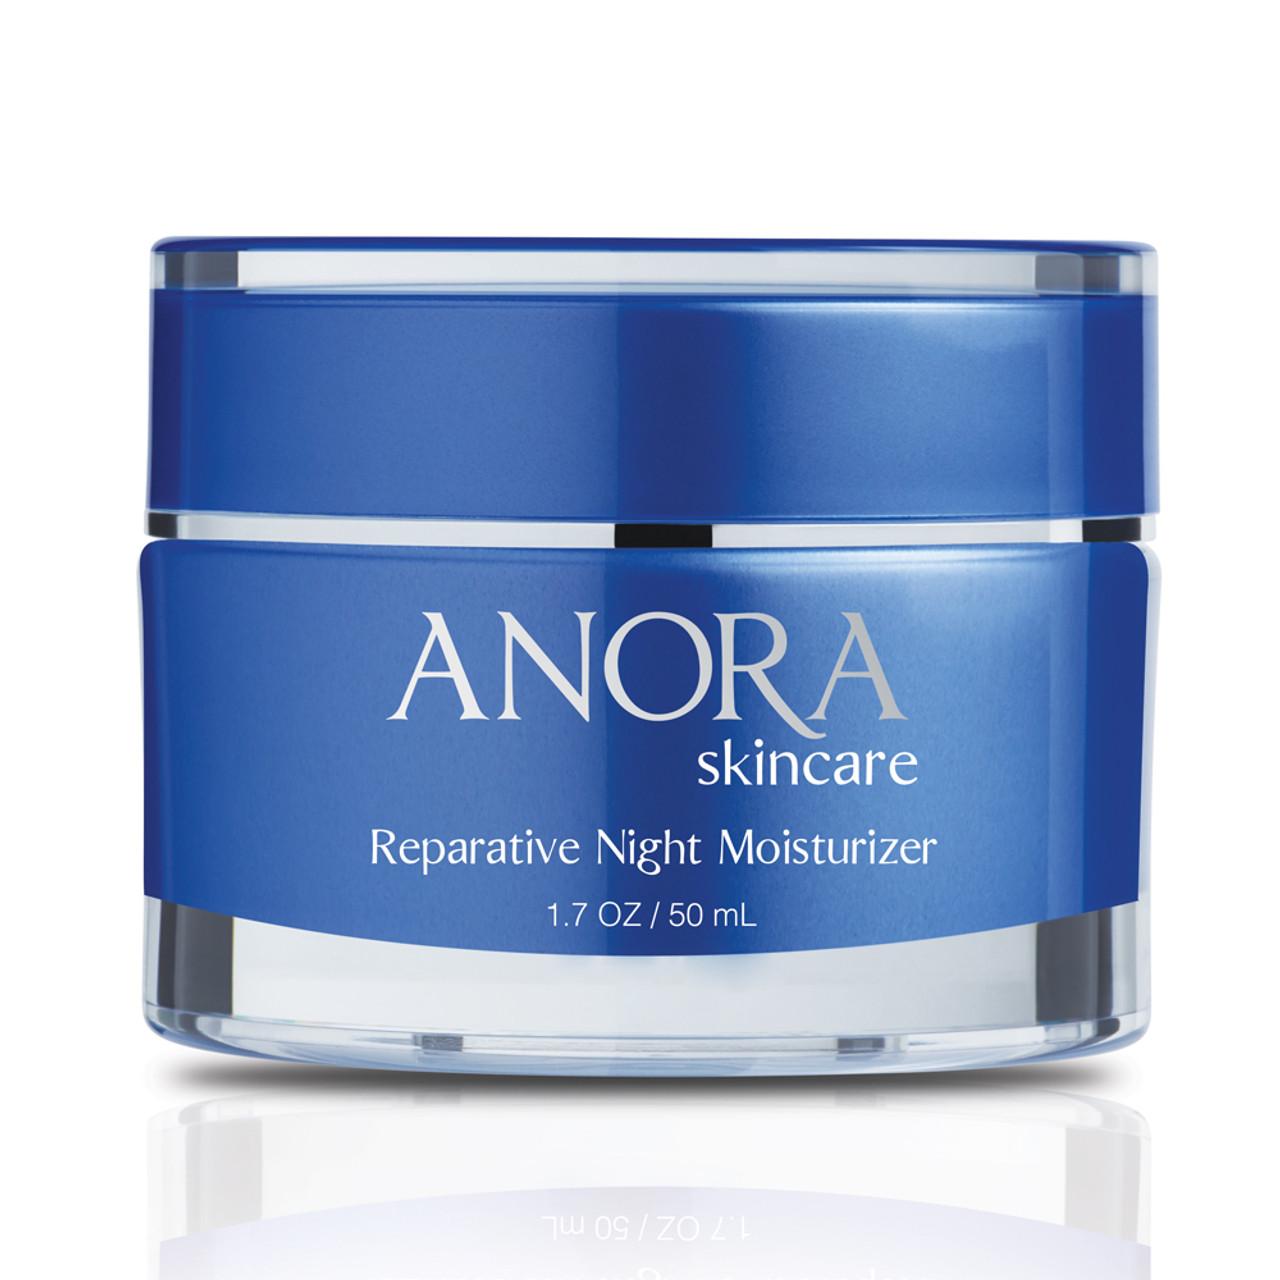 Anora Skincare Reparative Night Moisturizer - Front